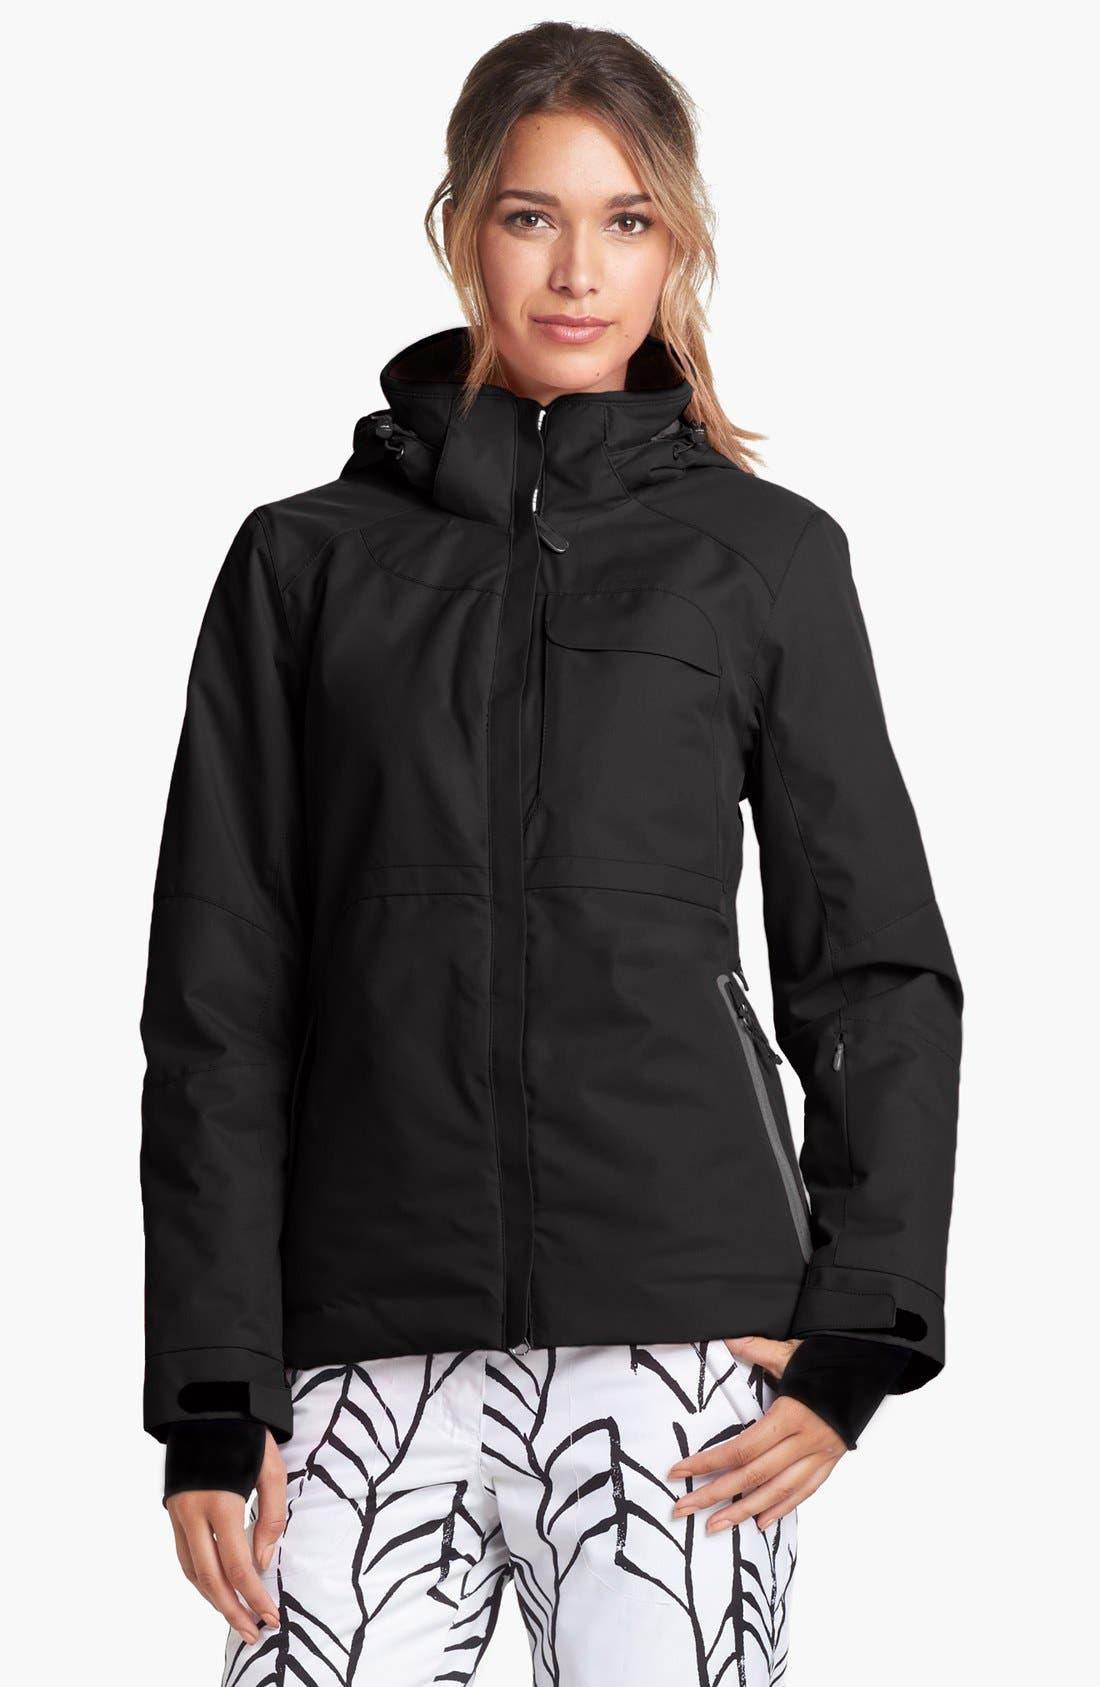 Alternate Image 1 Selected - Lole 'Lea' Ski Jacket